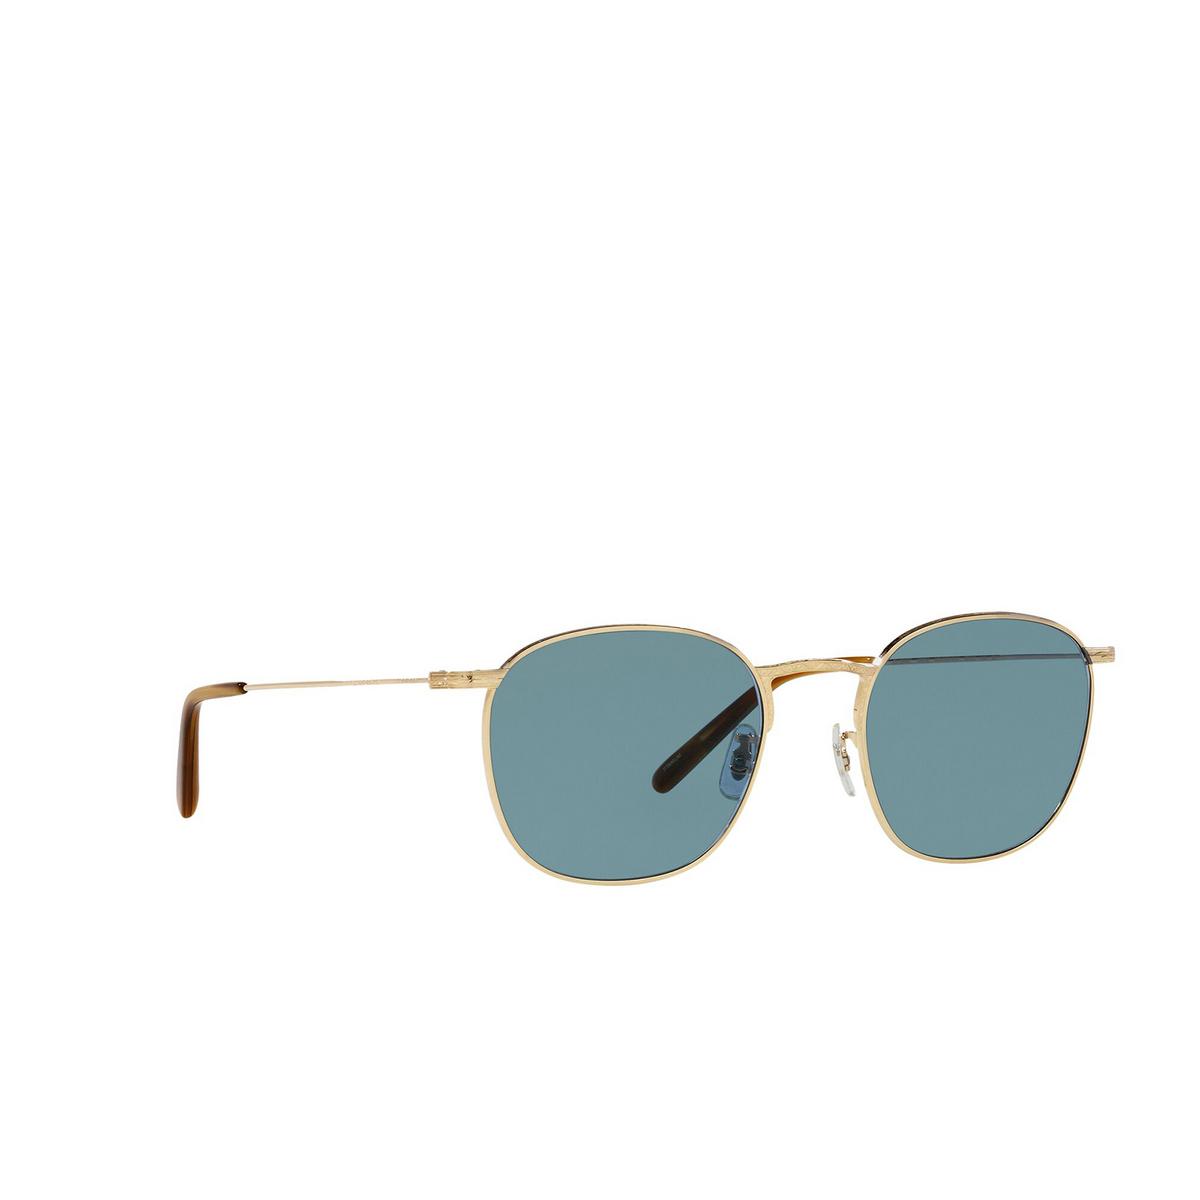 Oliver Peoples® Square Sunglasses: Goldsen Sun OV1285ST color Gold 529256 - three-quarters view.